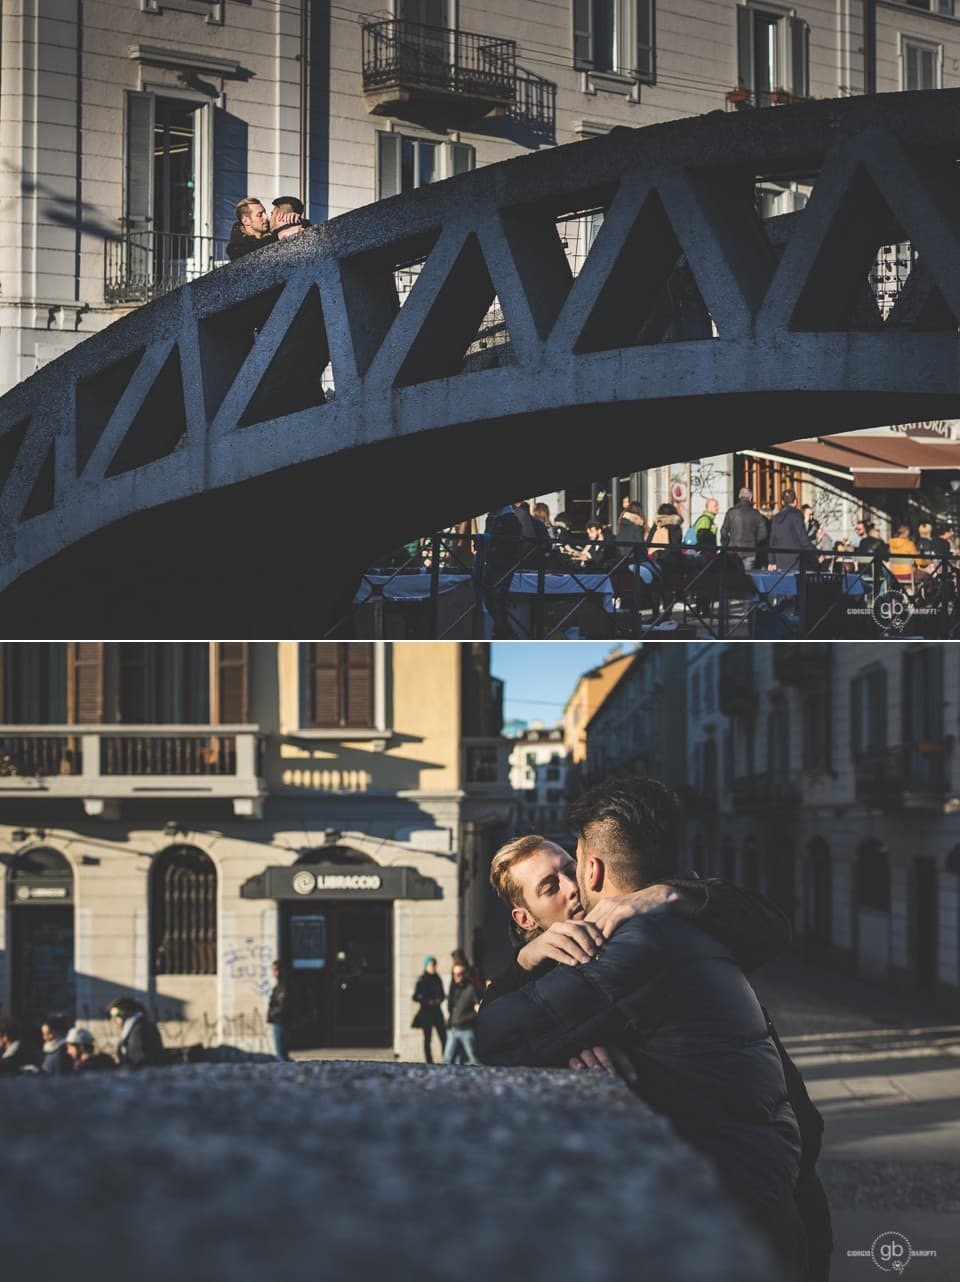 samesex engagement a Milano